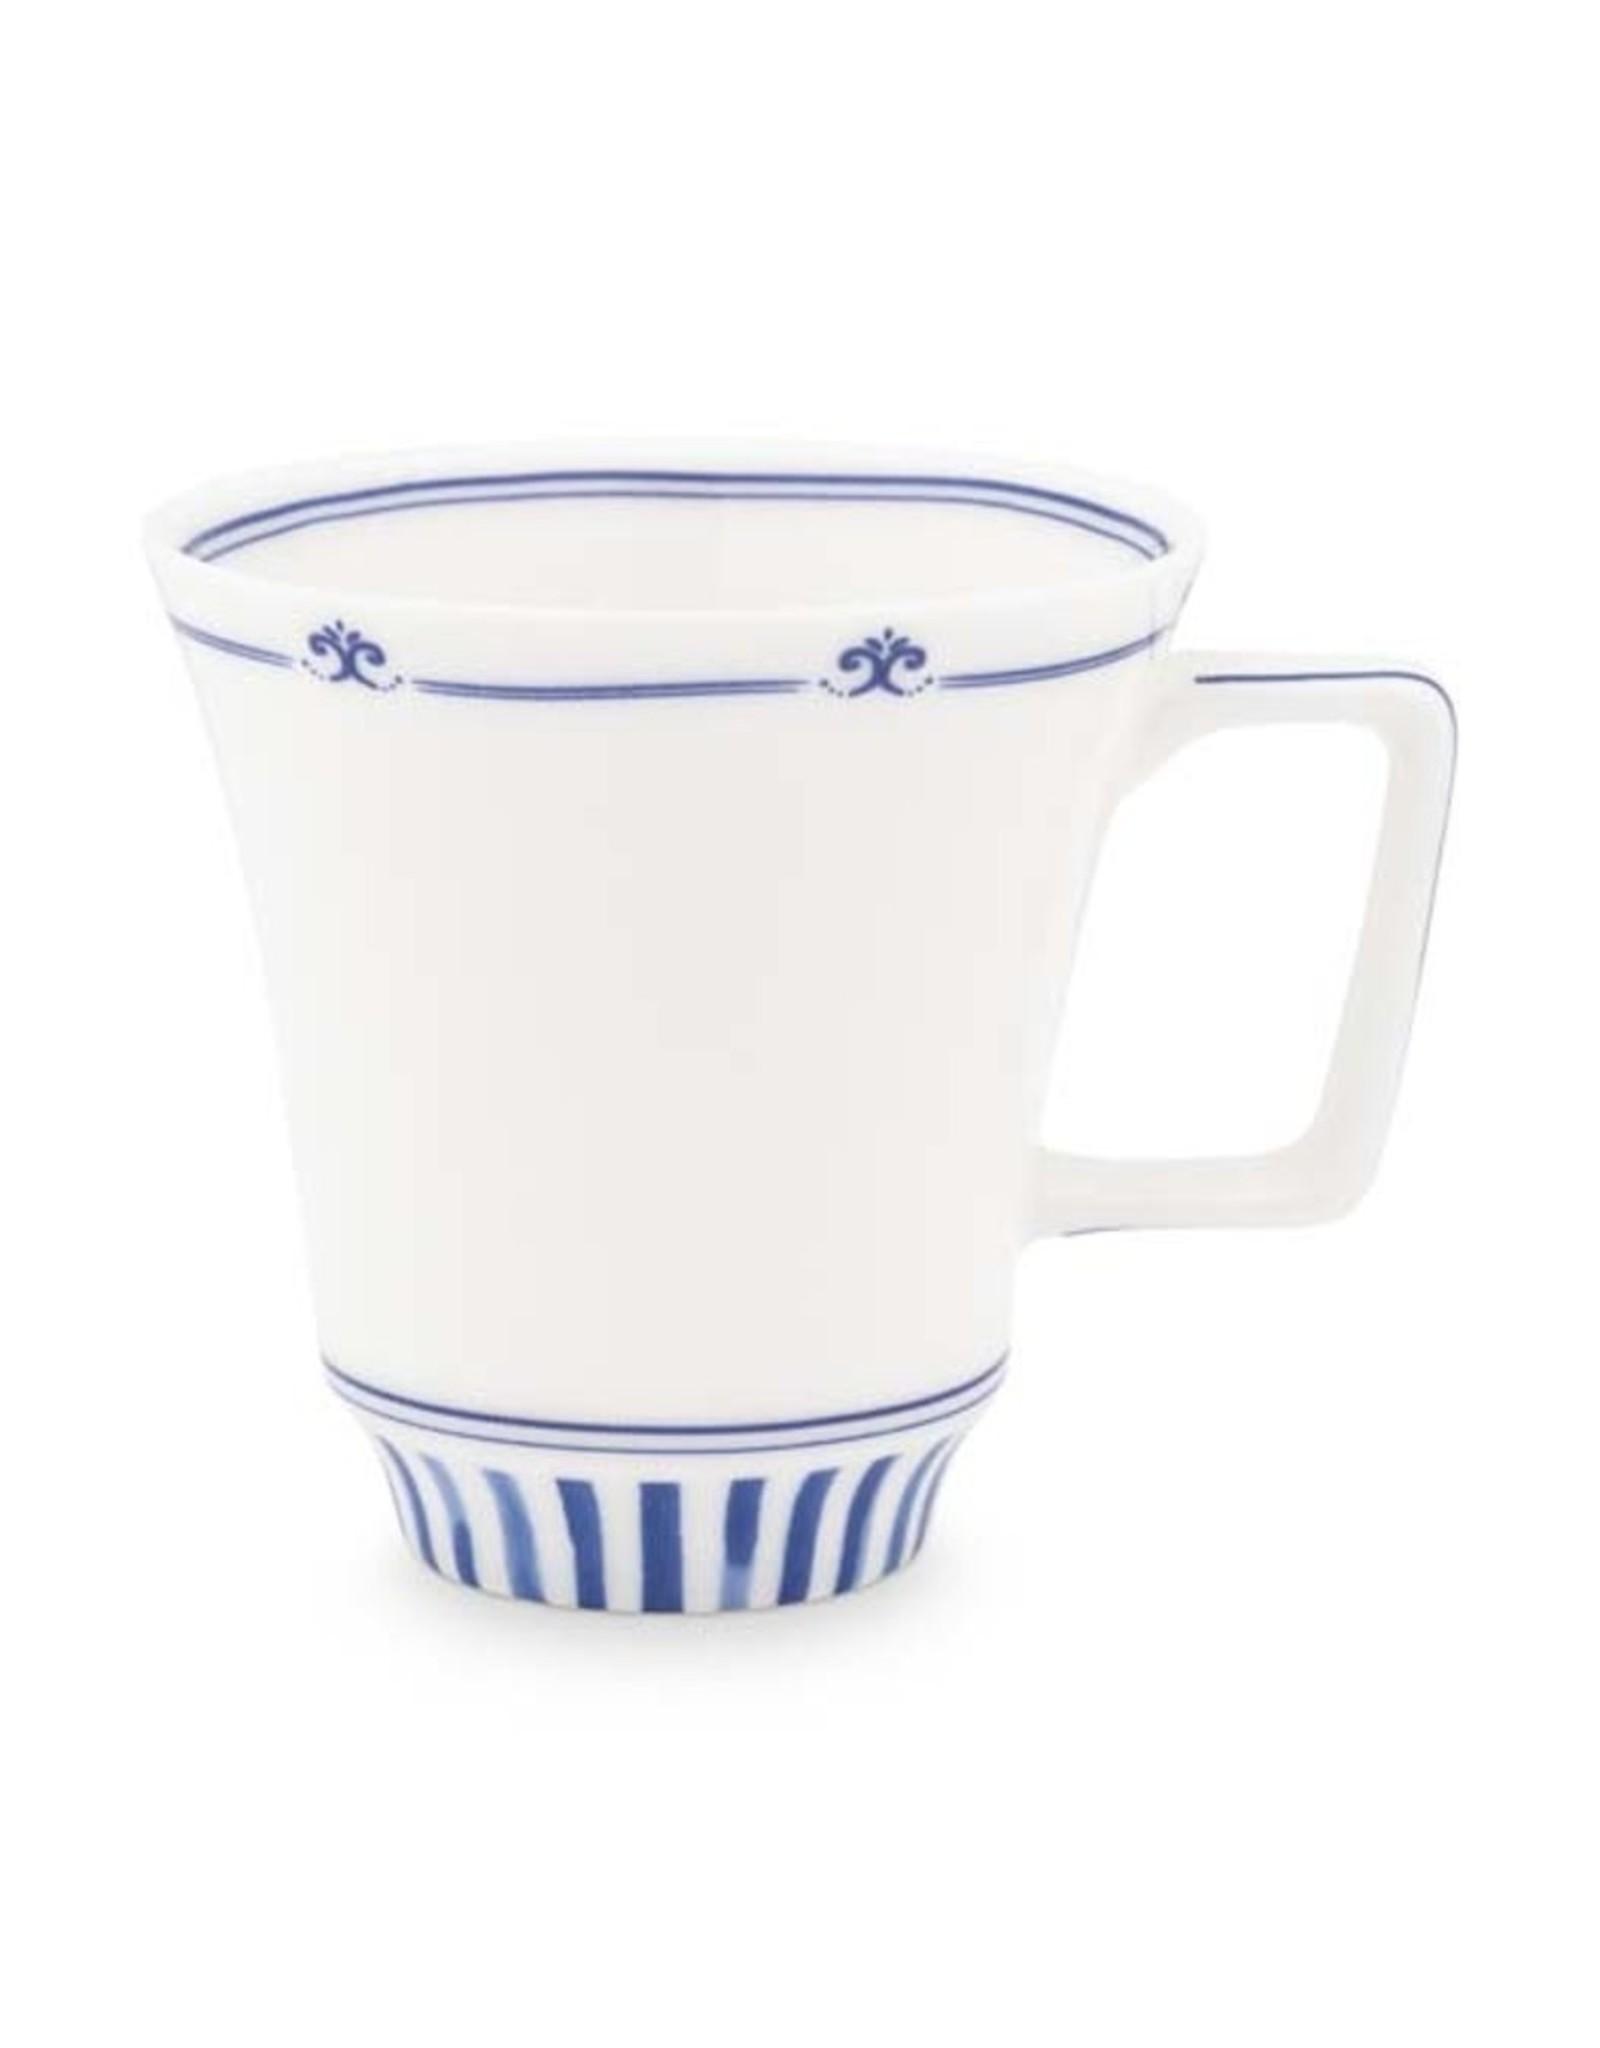 Janny van der Heijden Mug Small 145ml